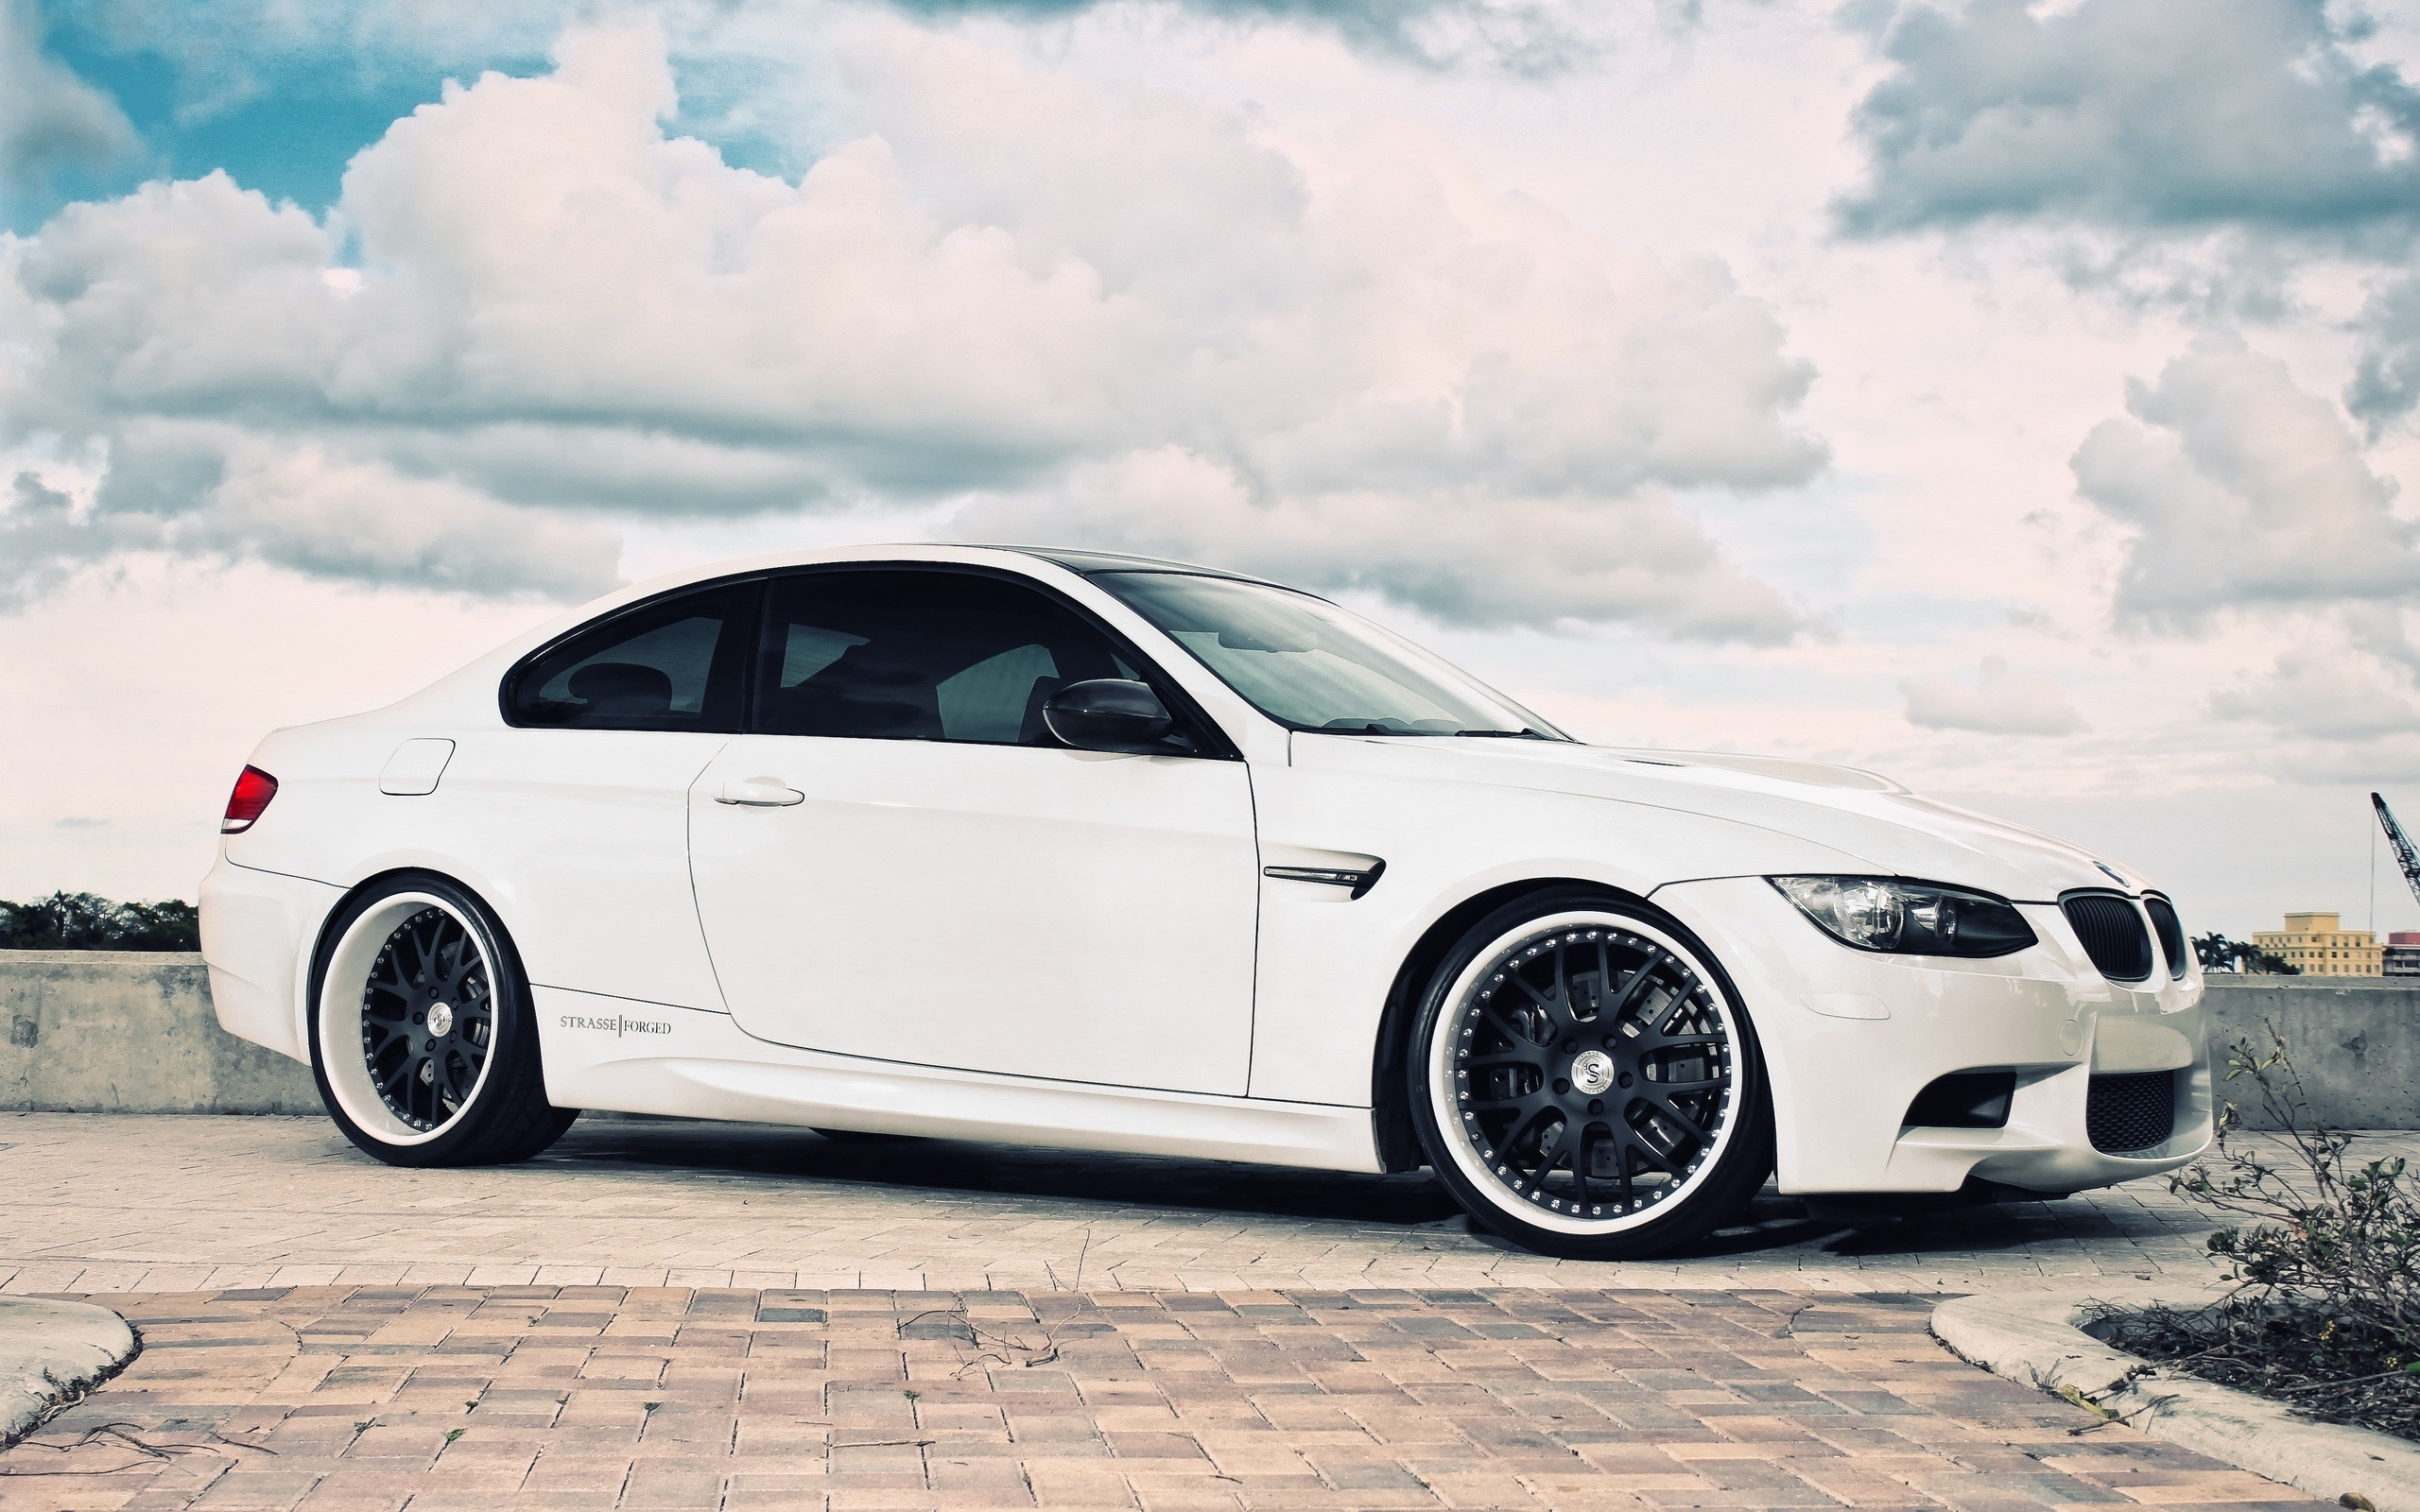 Luxury Bmw Cars 4 Wide Wallpaper